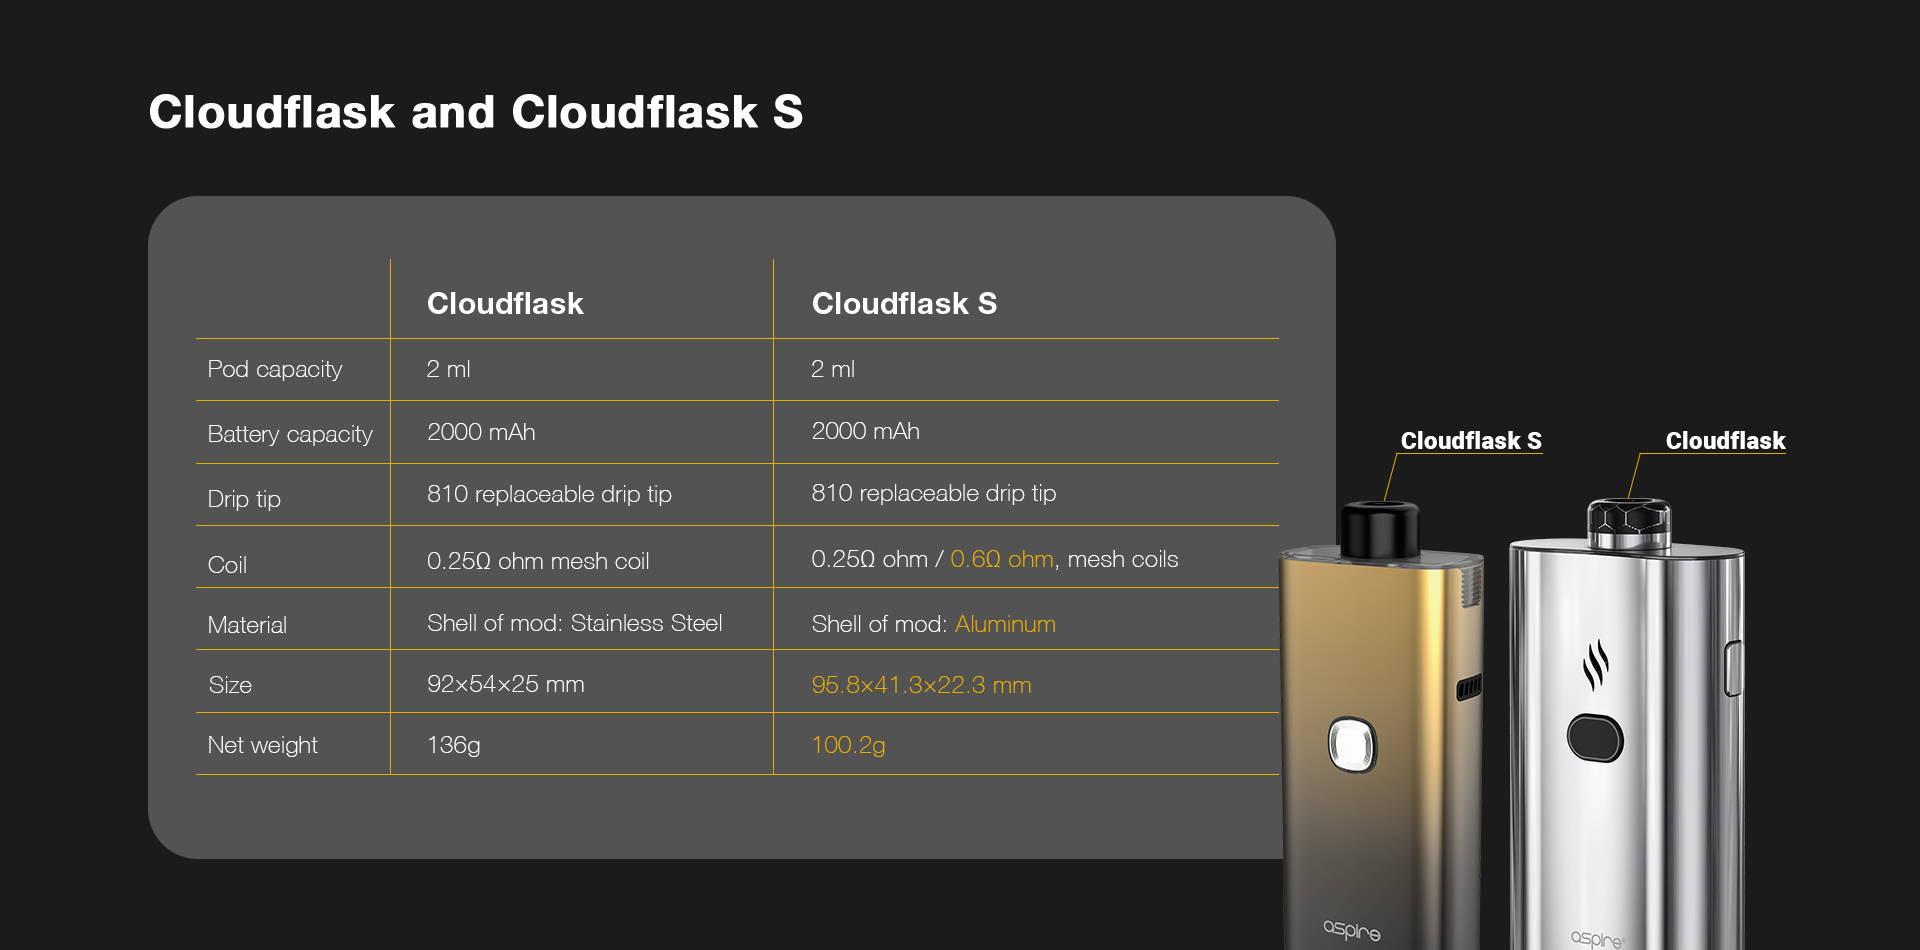 cloudflask-s-11.jpg